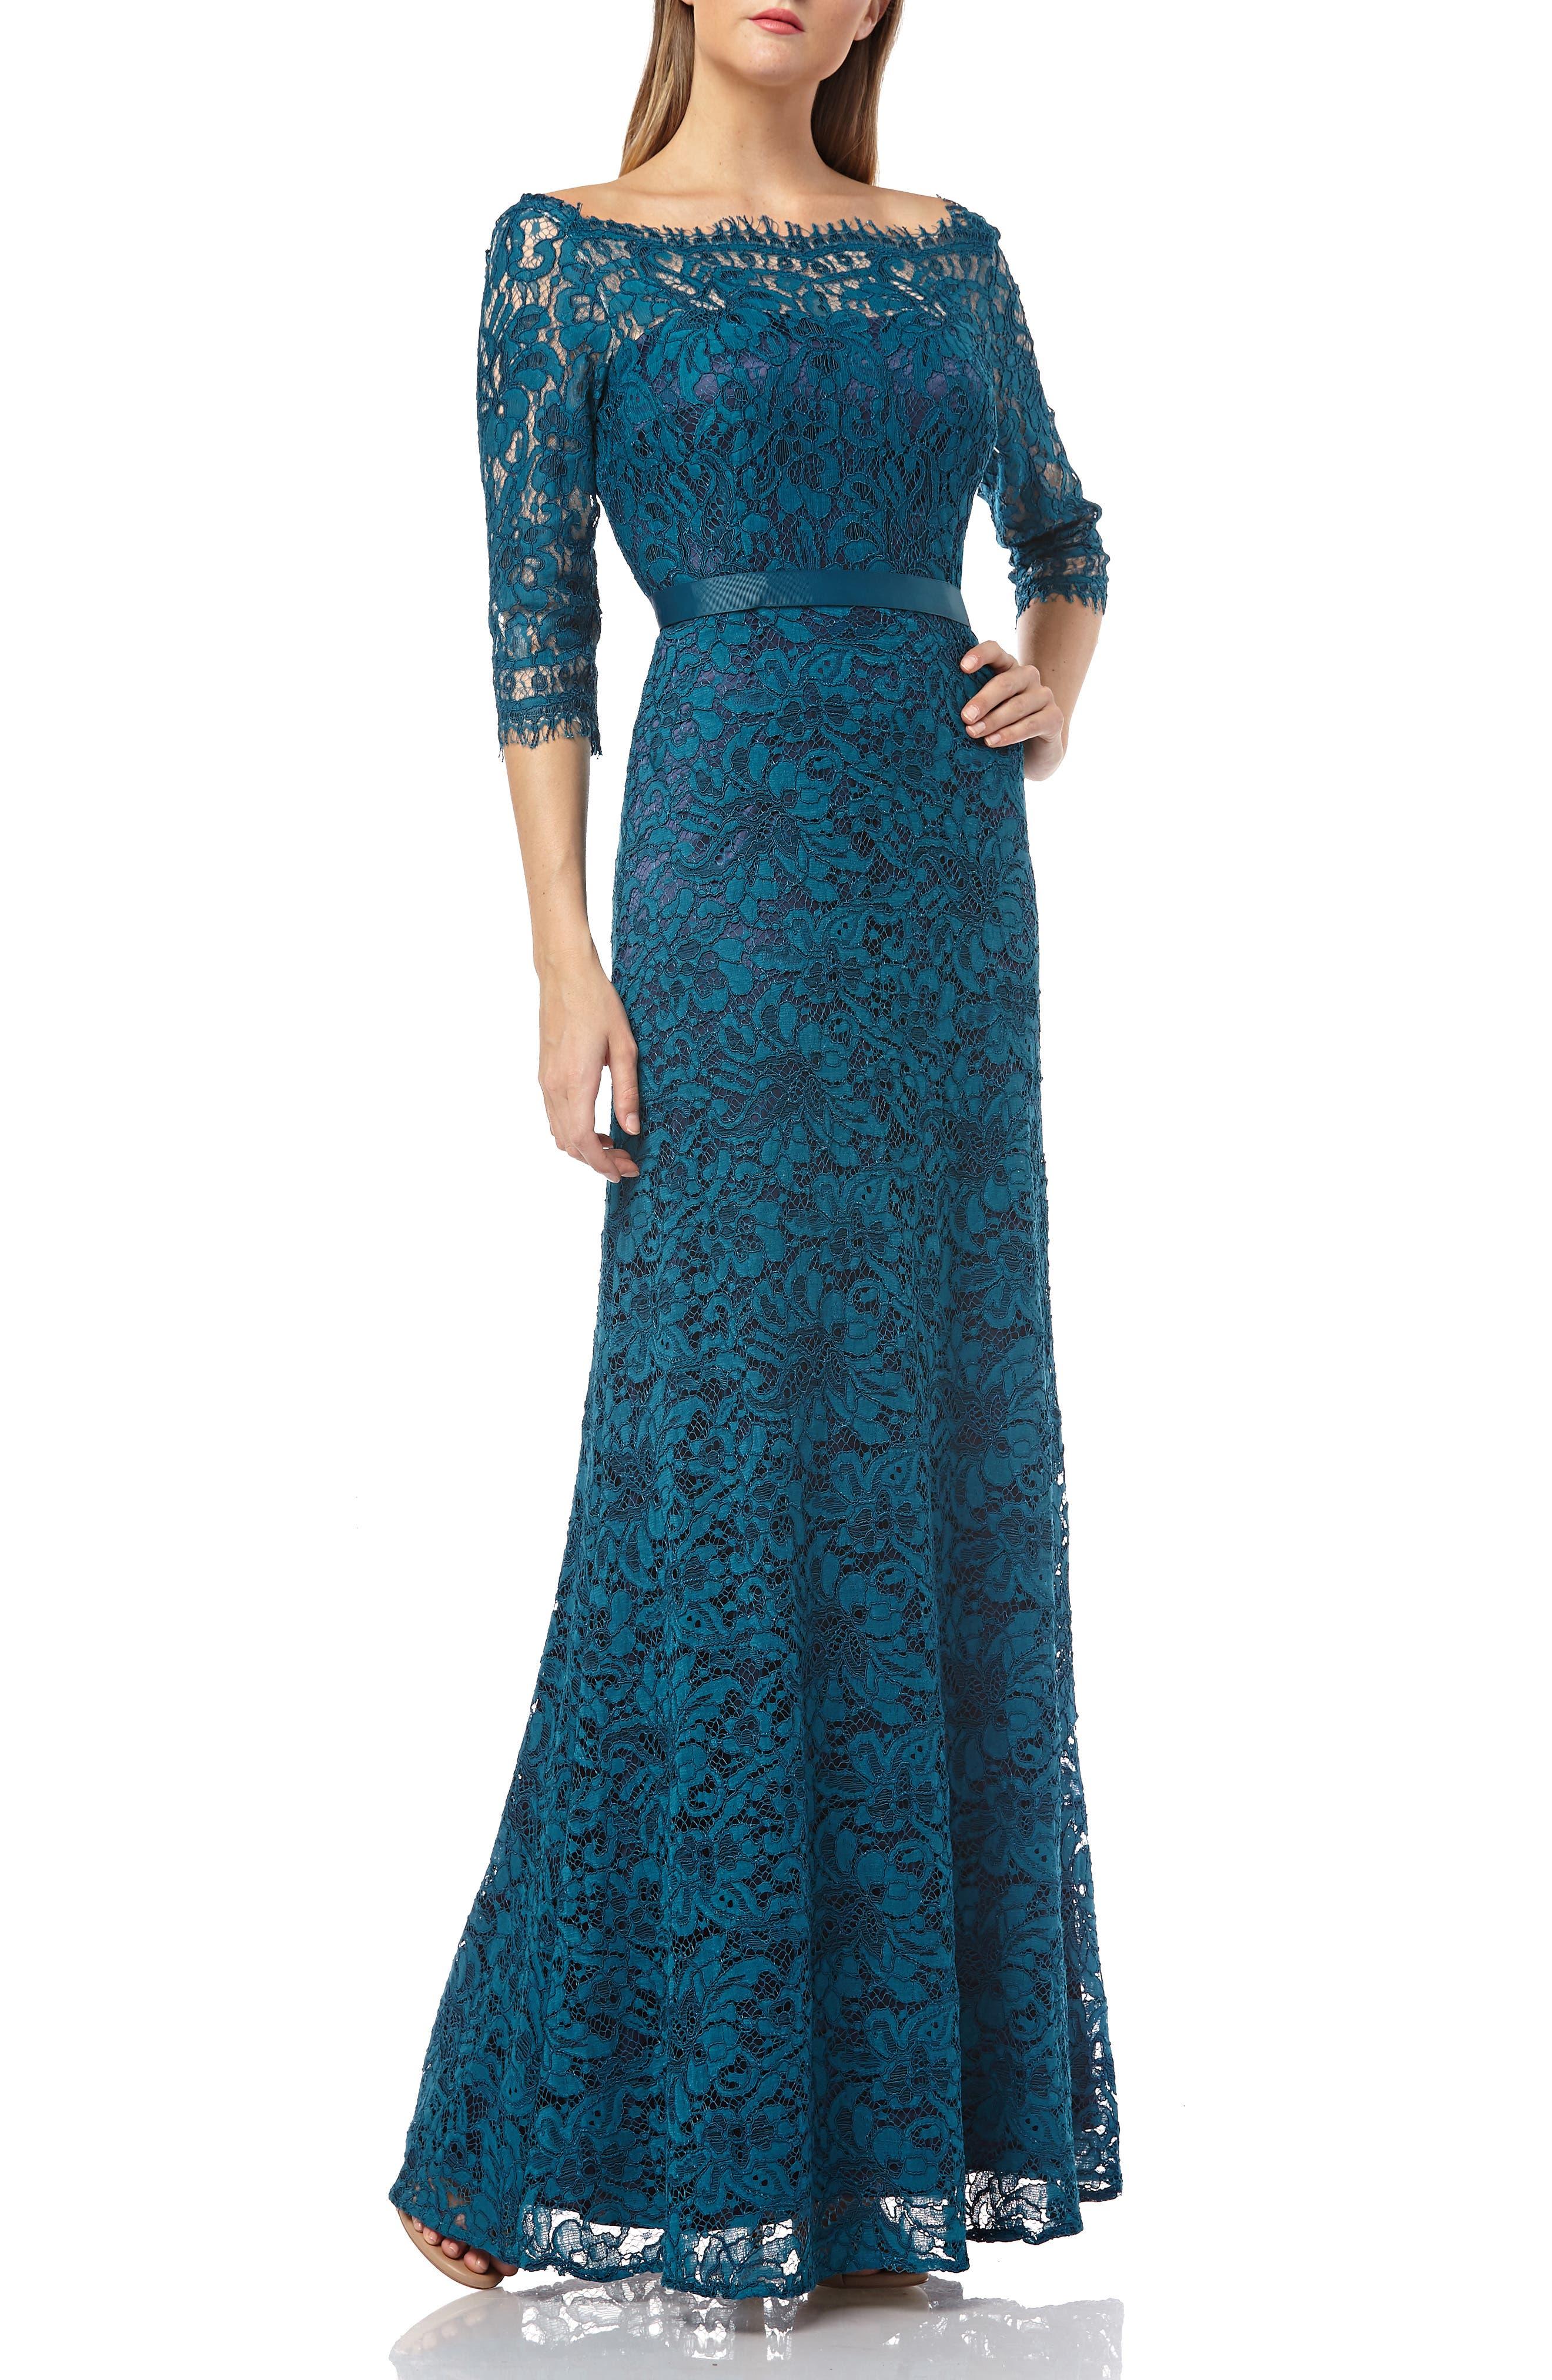 JS COLLECTIONS Bateau Neck Lace Gown, Main, color, TURQOISE NAVY